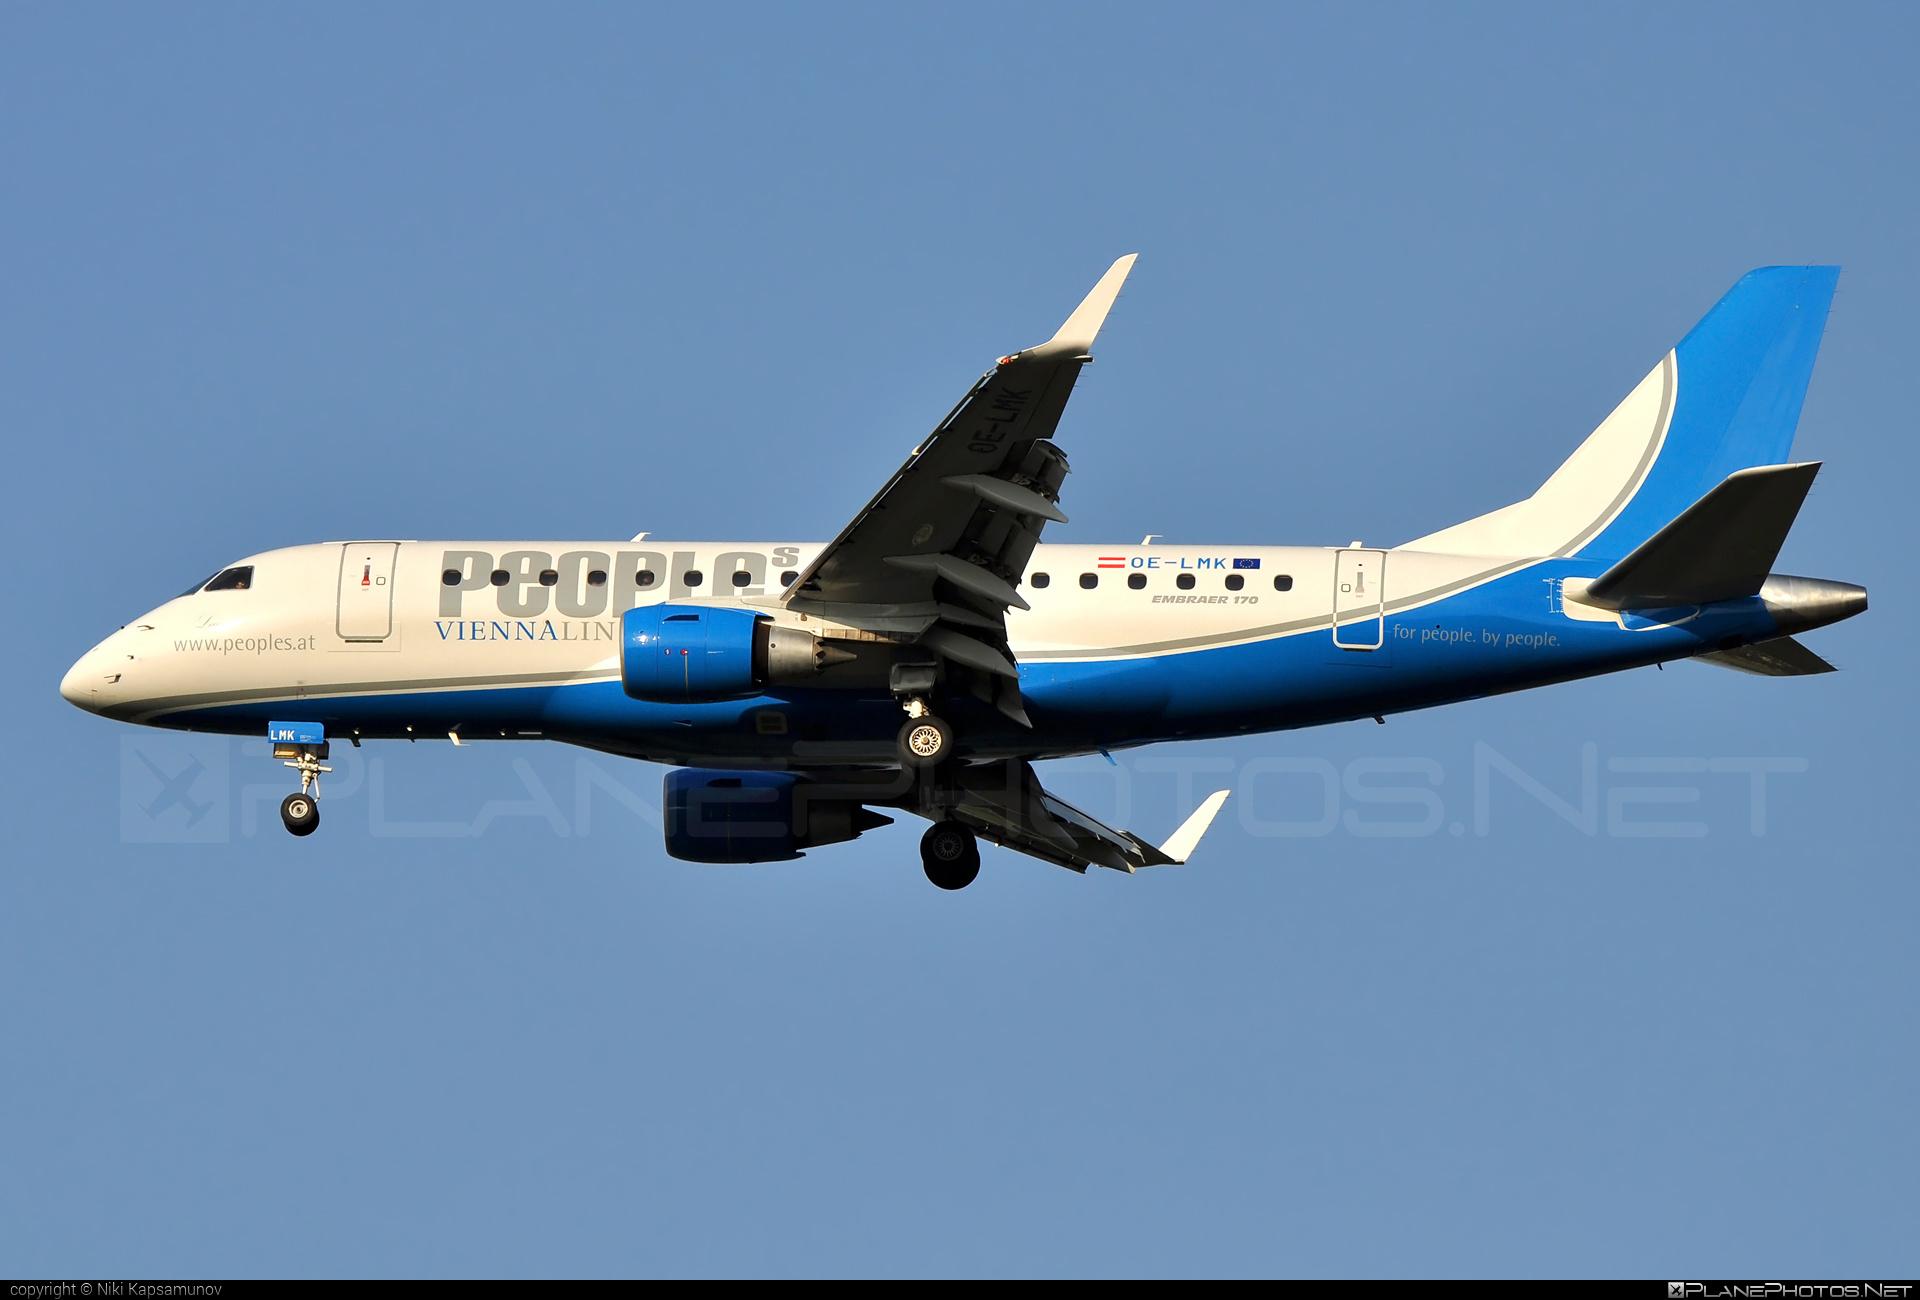 Embraer E170LR (ERJ-170-100LR) - OE-LMK operated by People`s Viennaline #e170 #embraer #embraer170 #embraer170lr #erj170 #erj170100 #erj170100lr #erj170lr